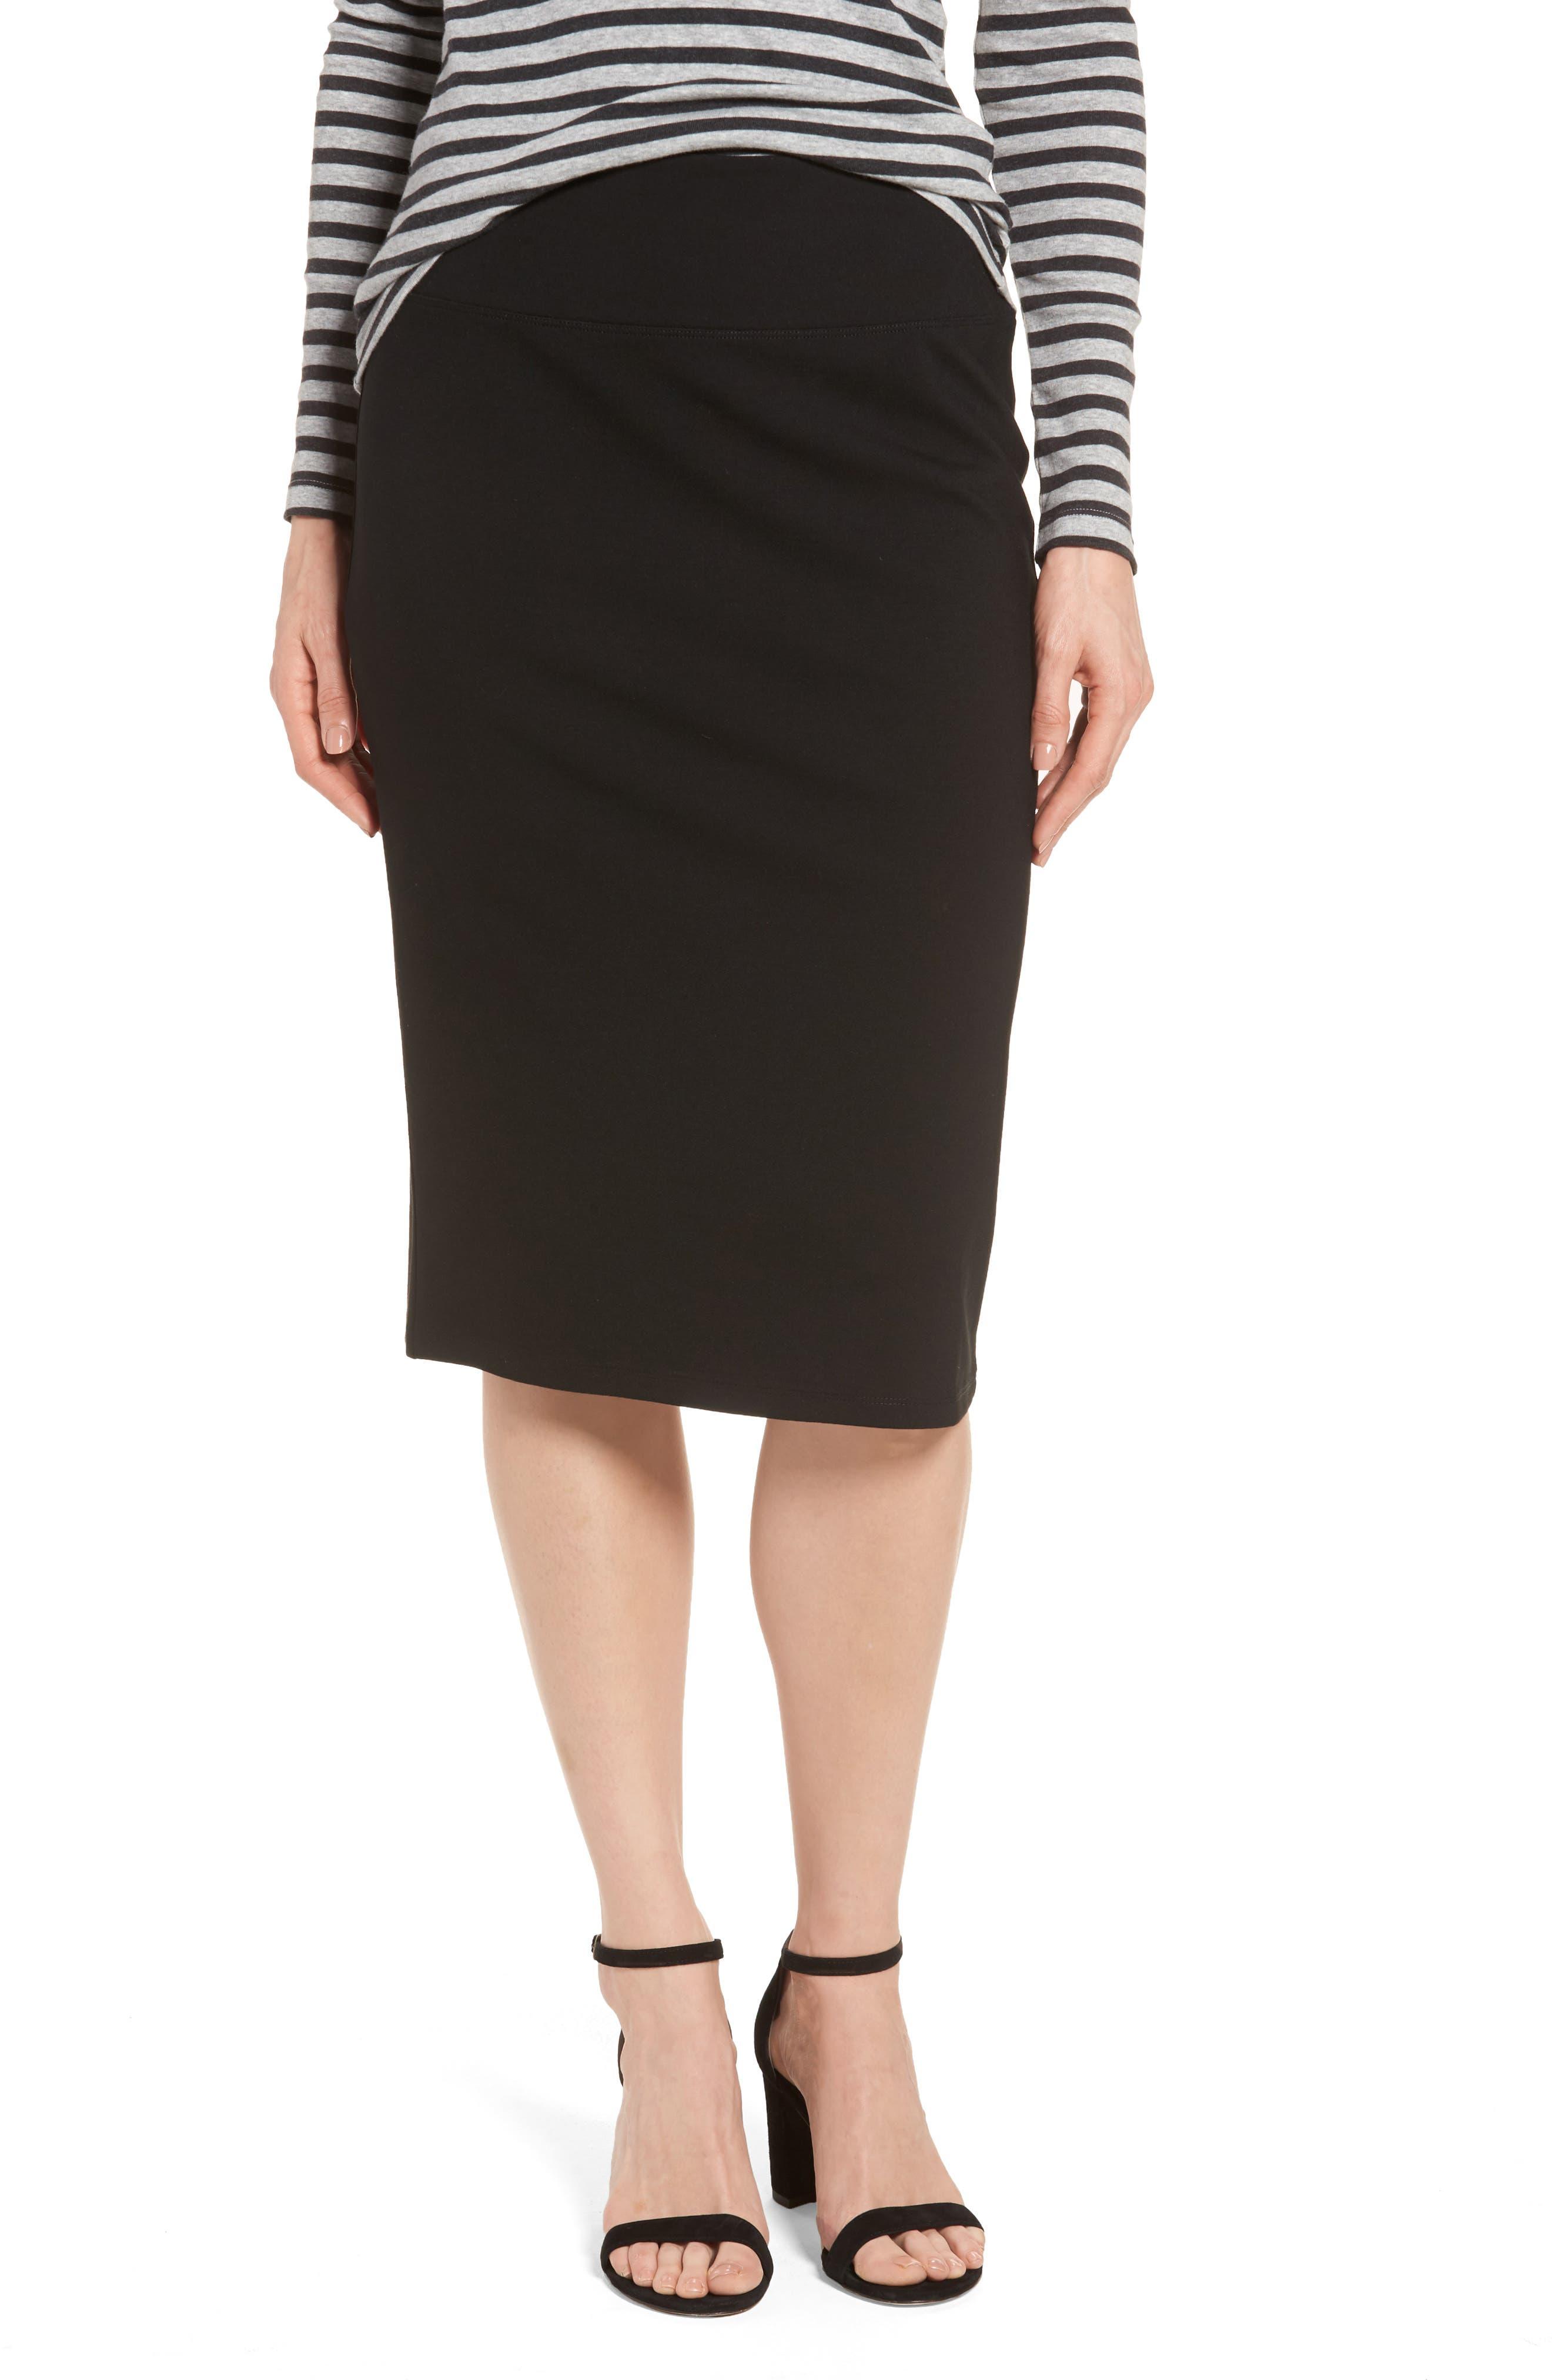 Alternate Image 1 Selected - Halogen® Ponte Pencil Skirt (Regular & Petite)